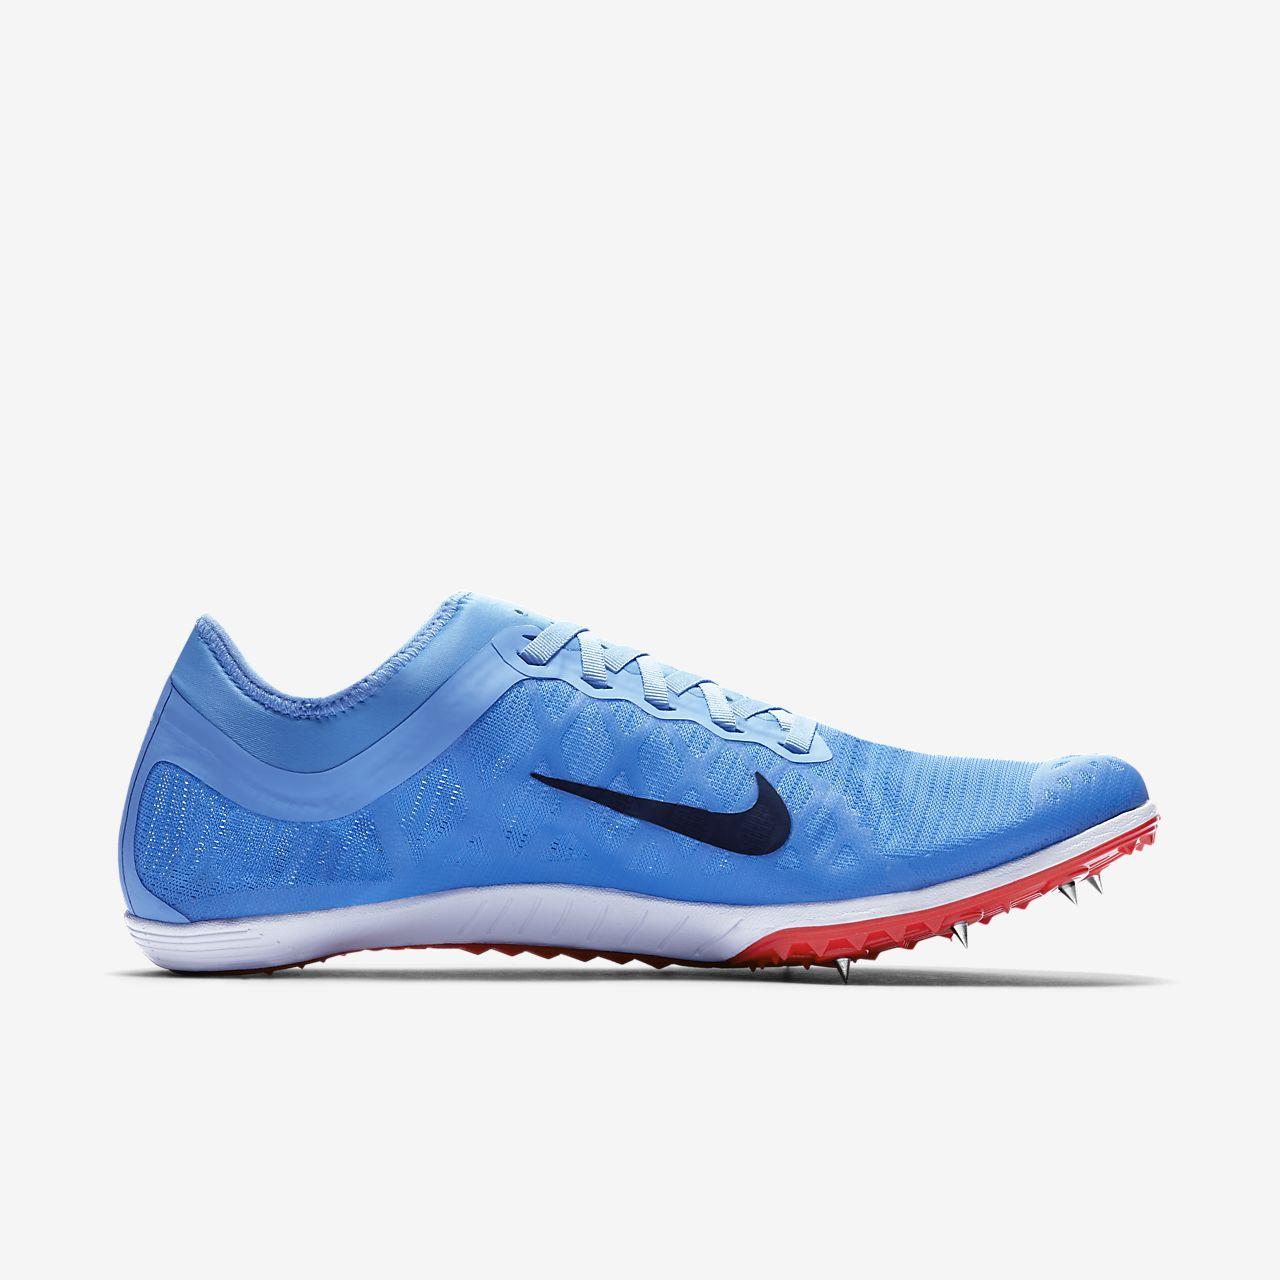 8d1f5bc69c52 Nike Zoom Mamba 3 Unisex Distance Spike. Nike.com IL